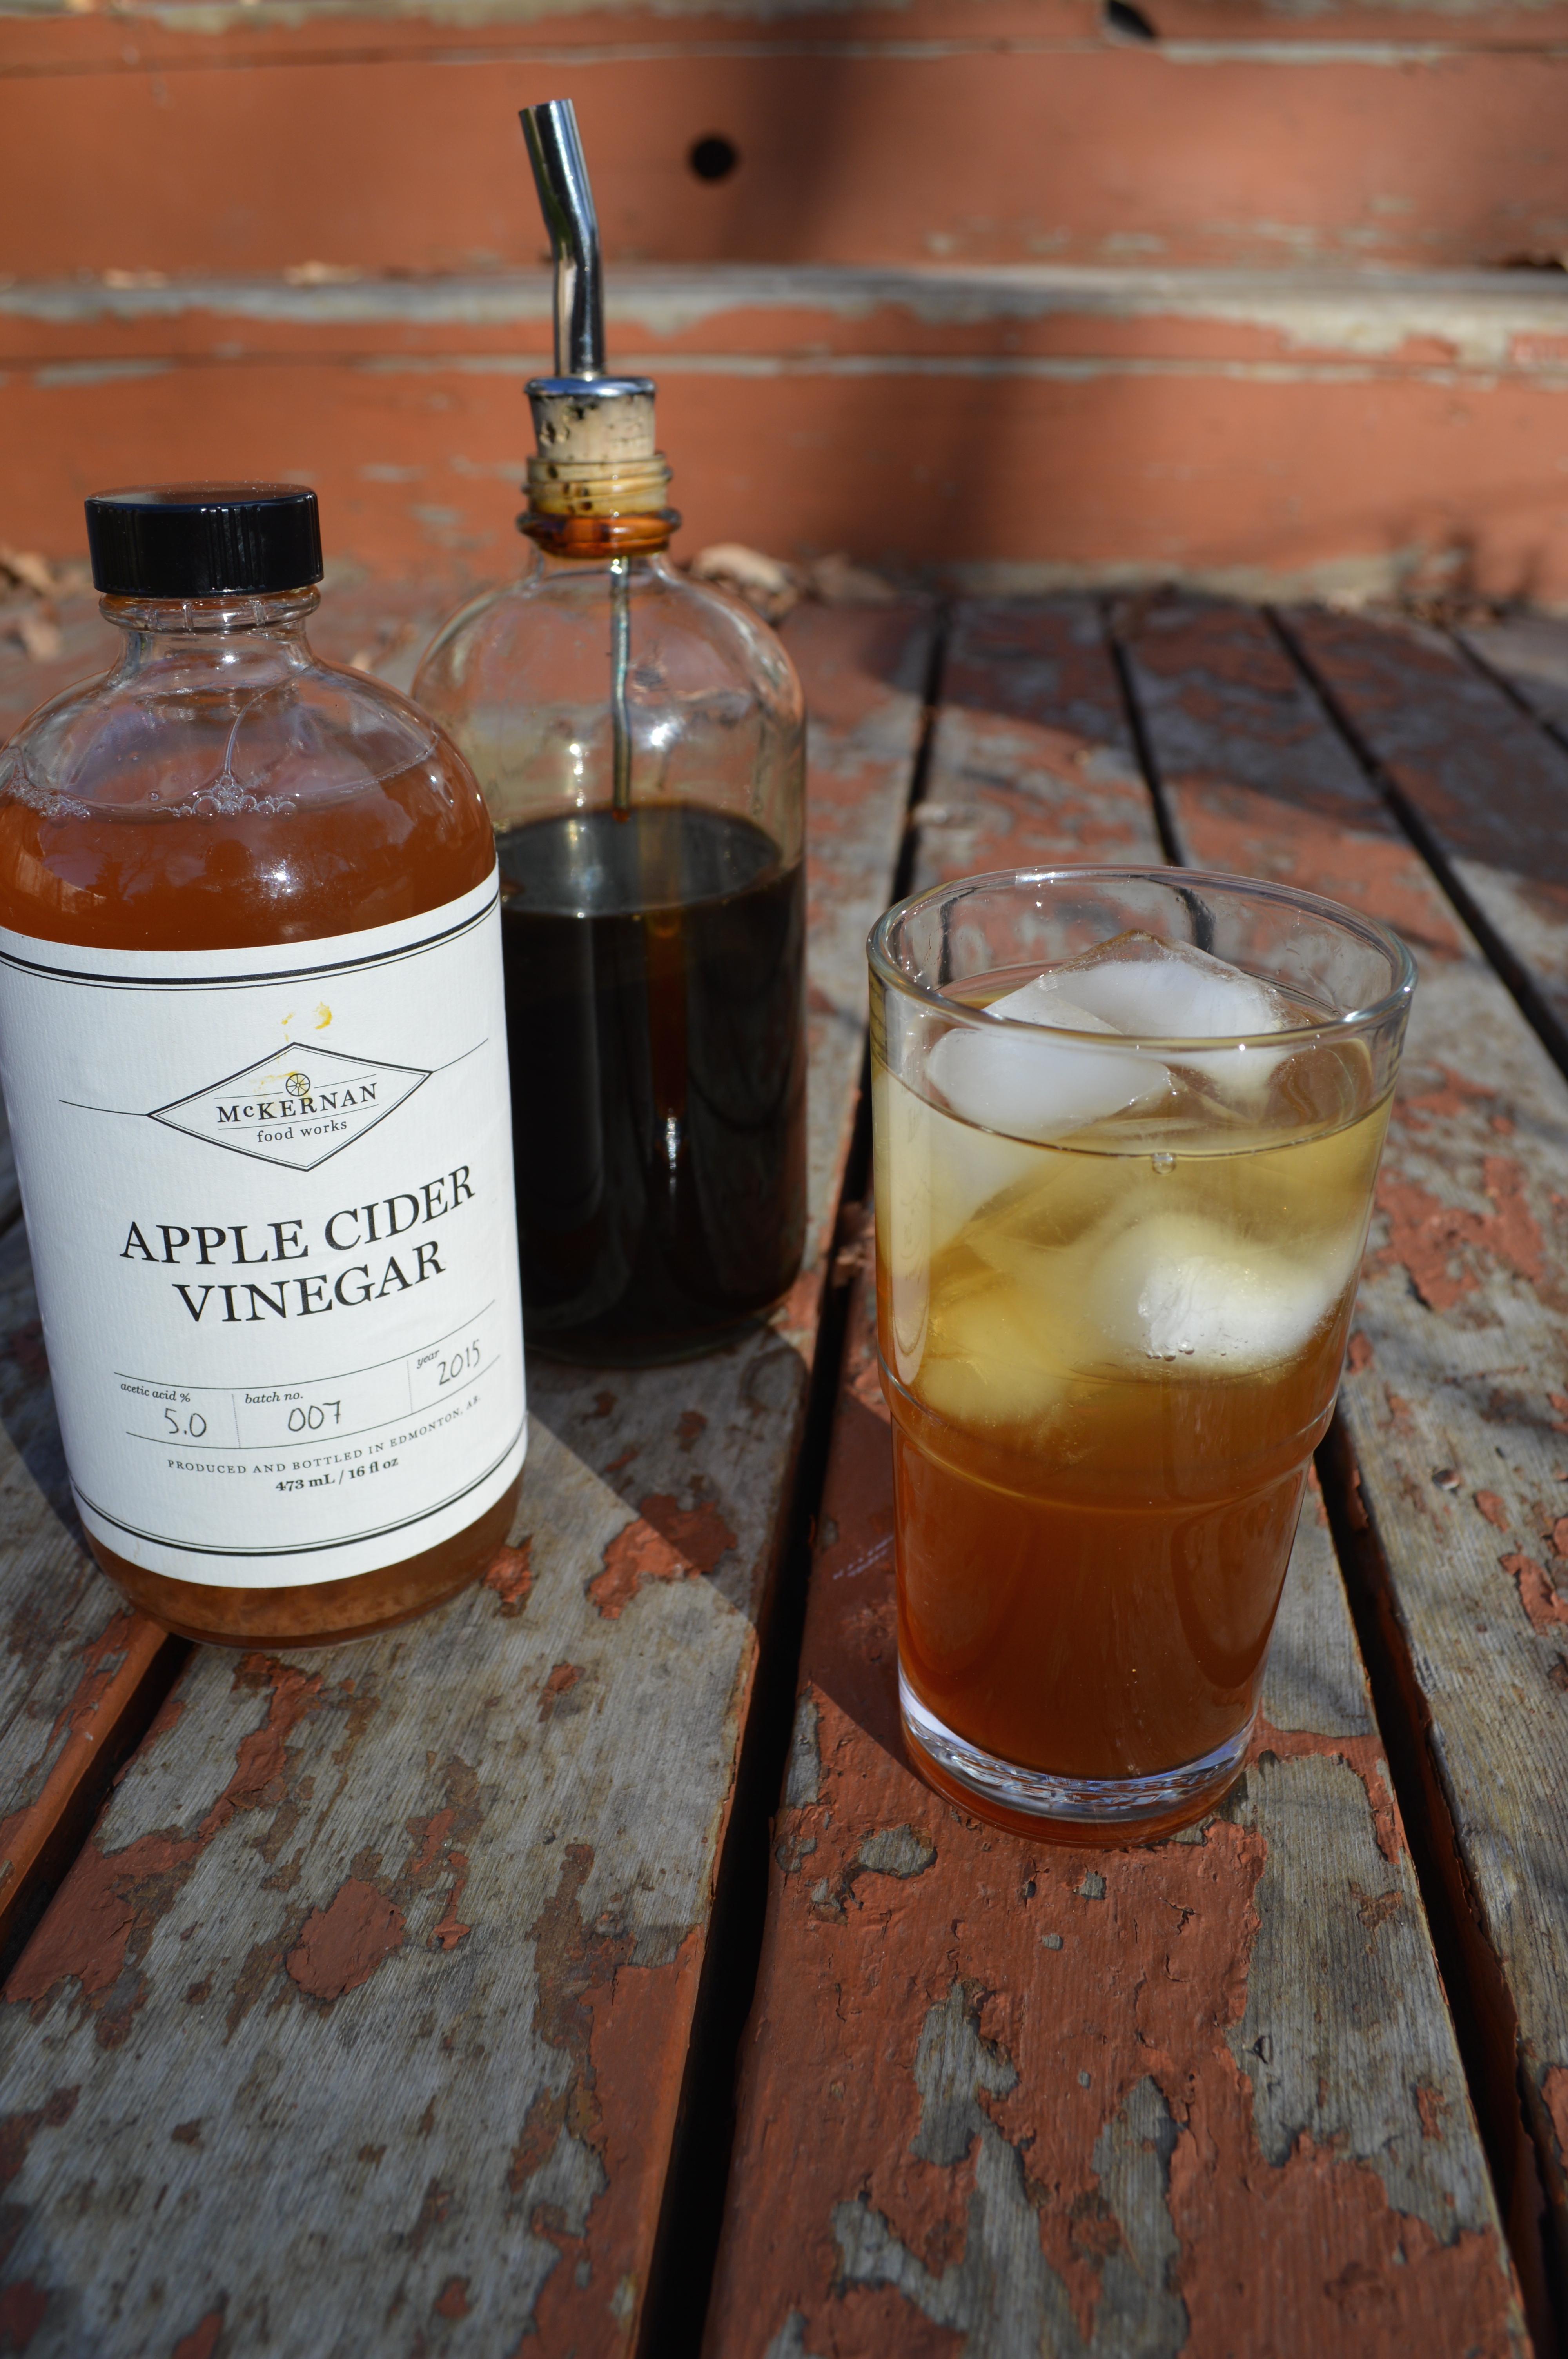 Switchel, old-timey drinking vinegar, make with apple cider vinegar, molasses, and ginger